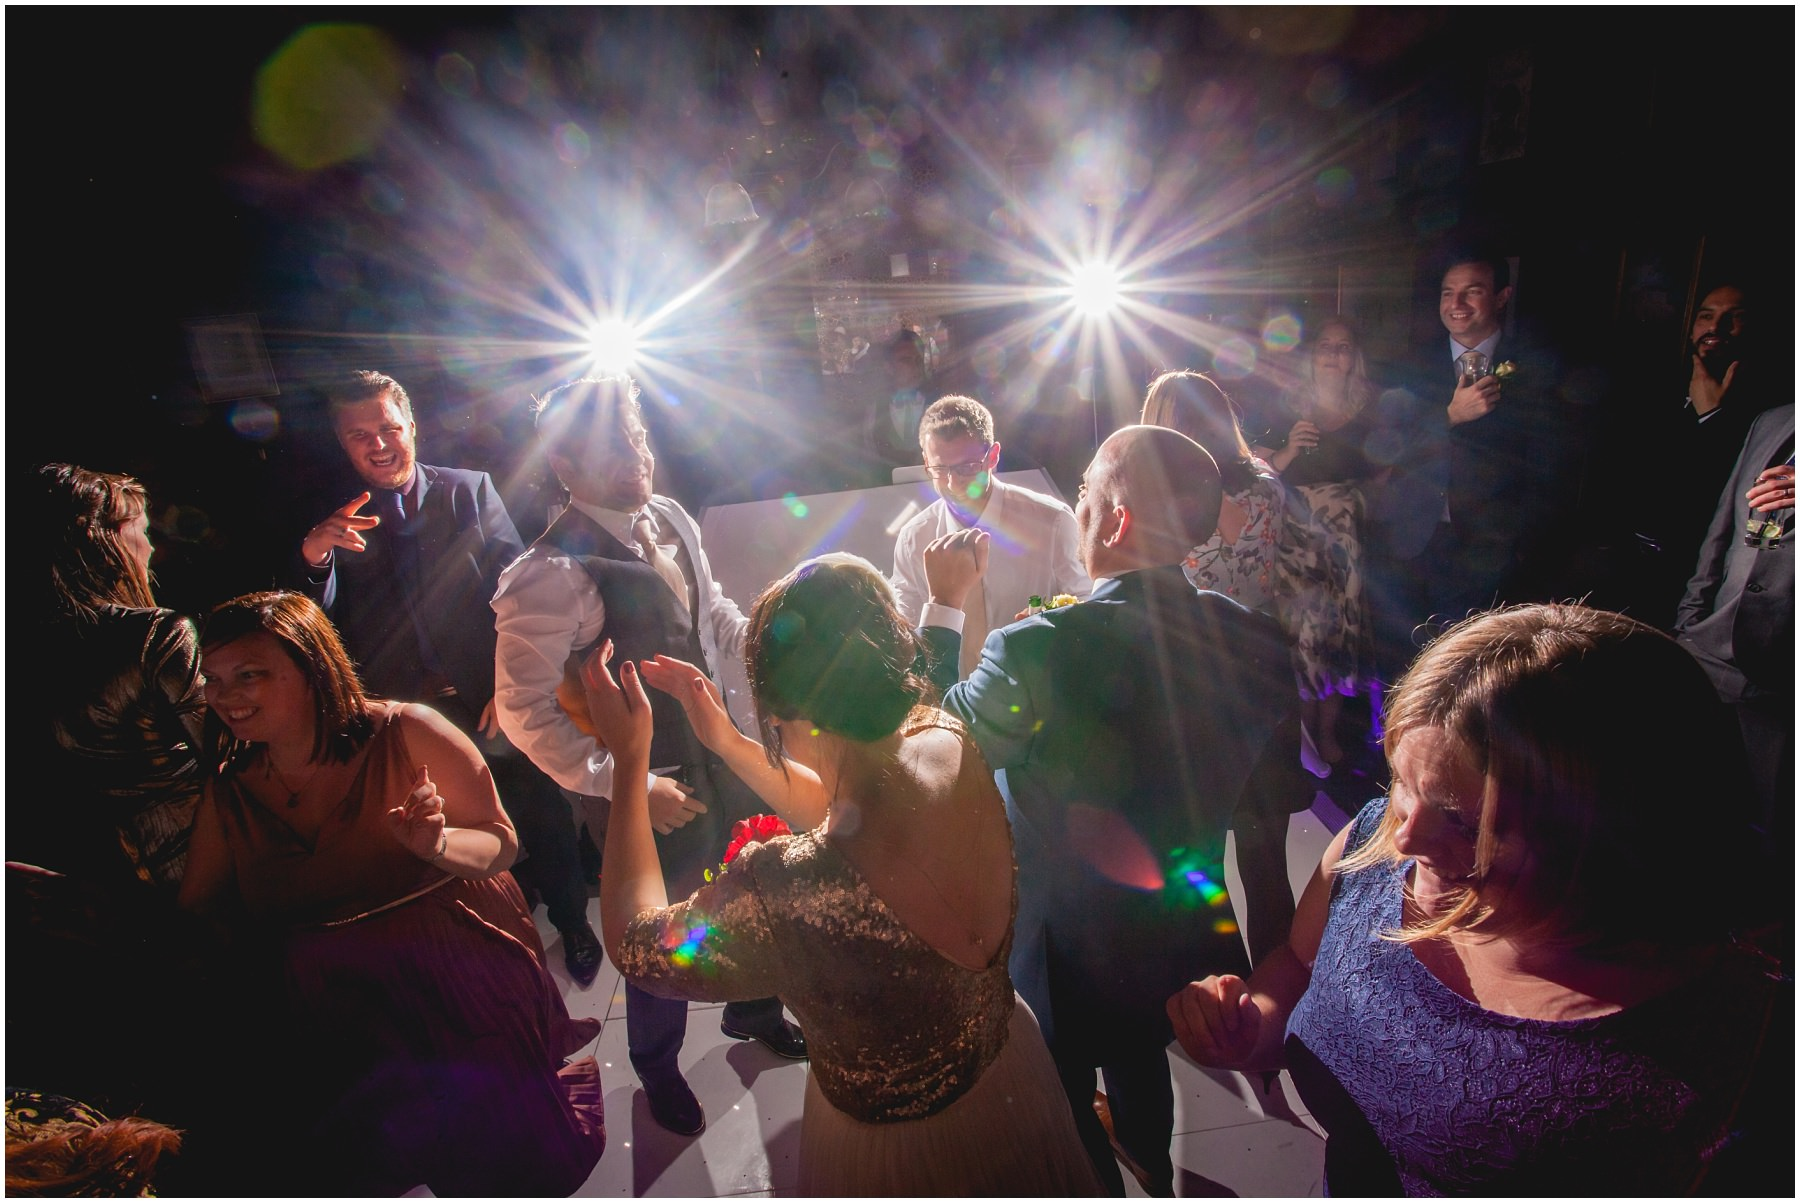 Dance Floor party at the belle epoque